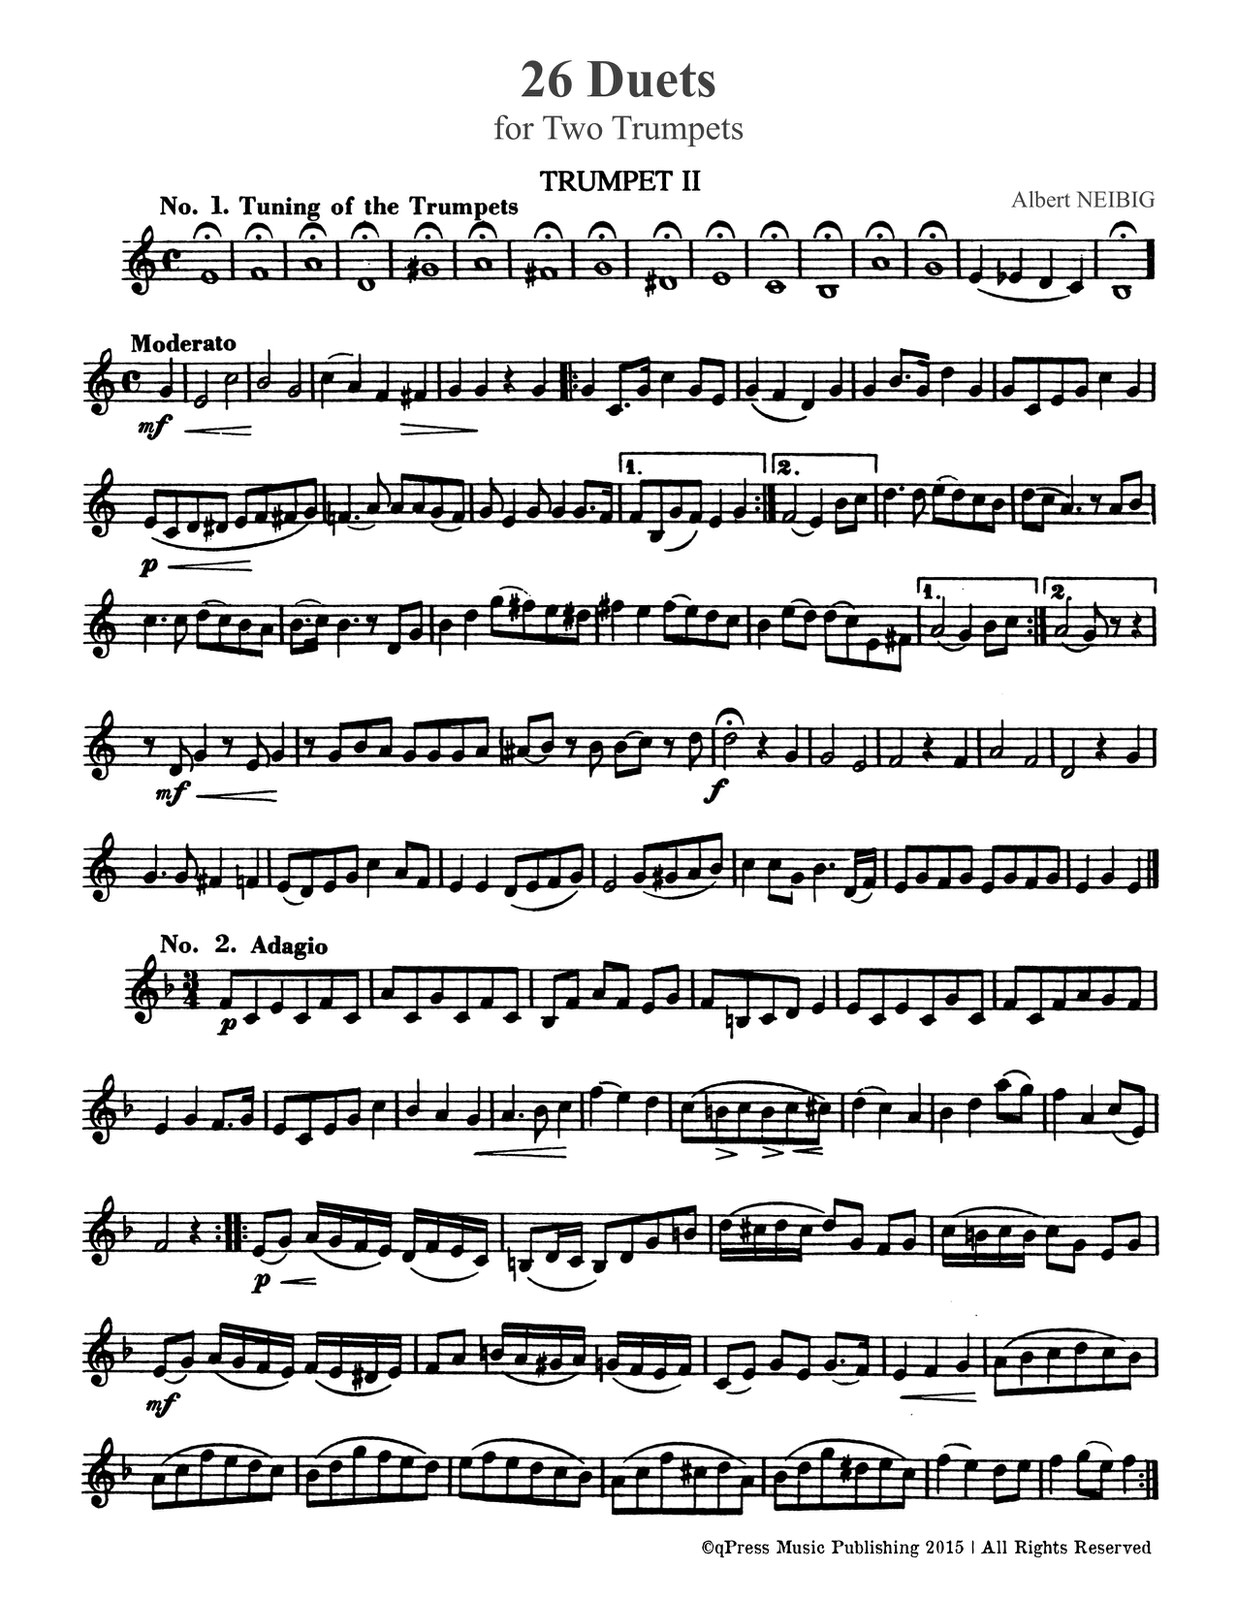 Neibig, Albert 26 Duets (Trumpet 2)